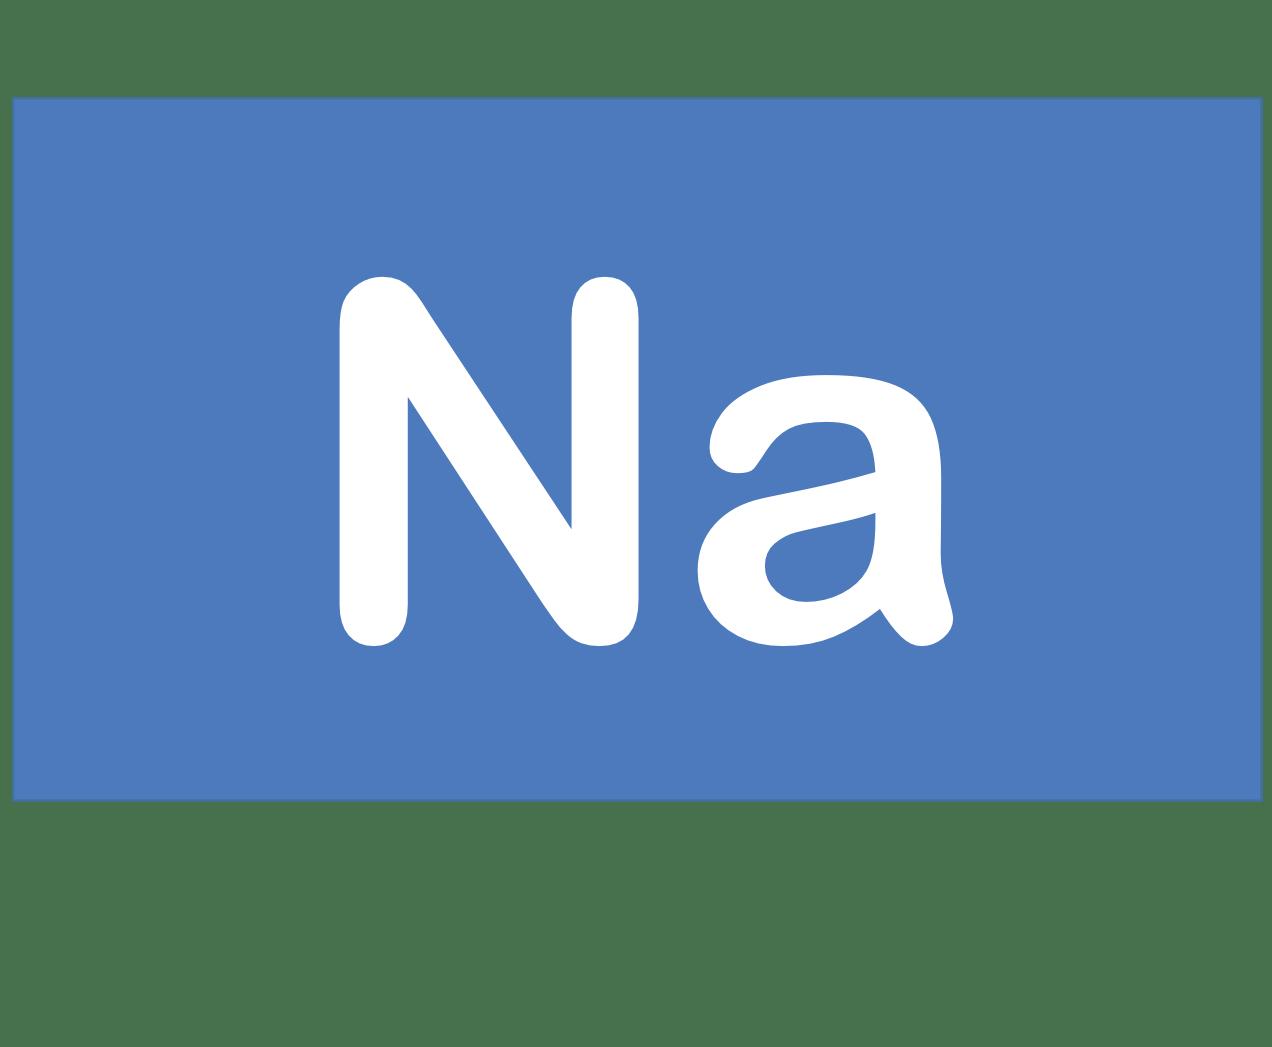 11 Na ナトリウム Sodium 元素 記号 周期表 化学 原子